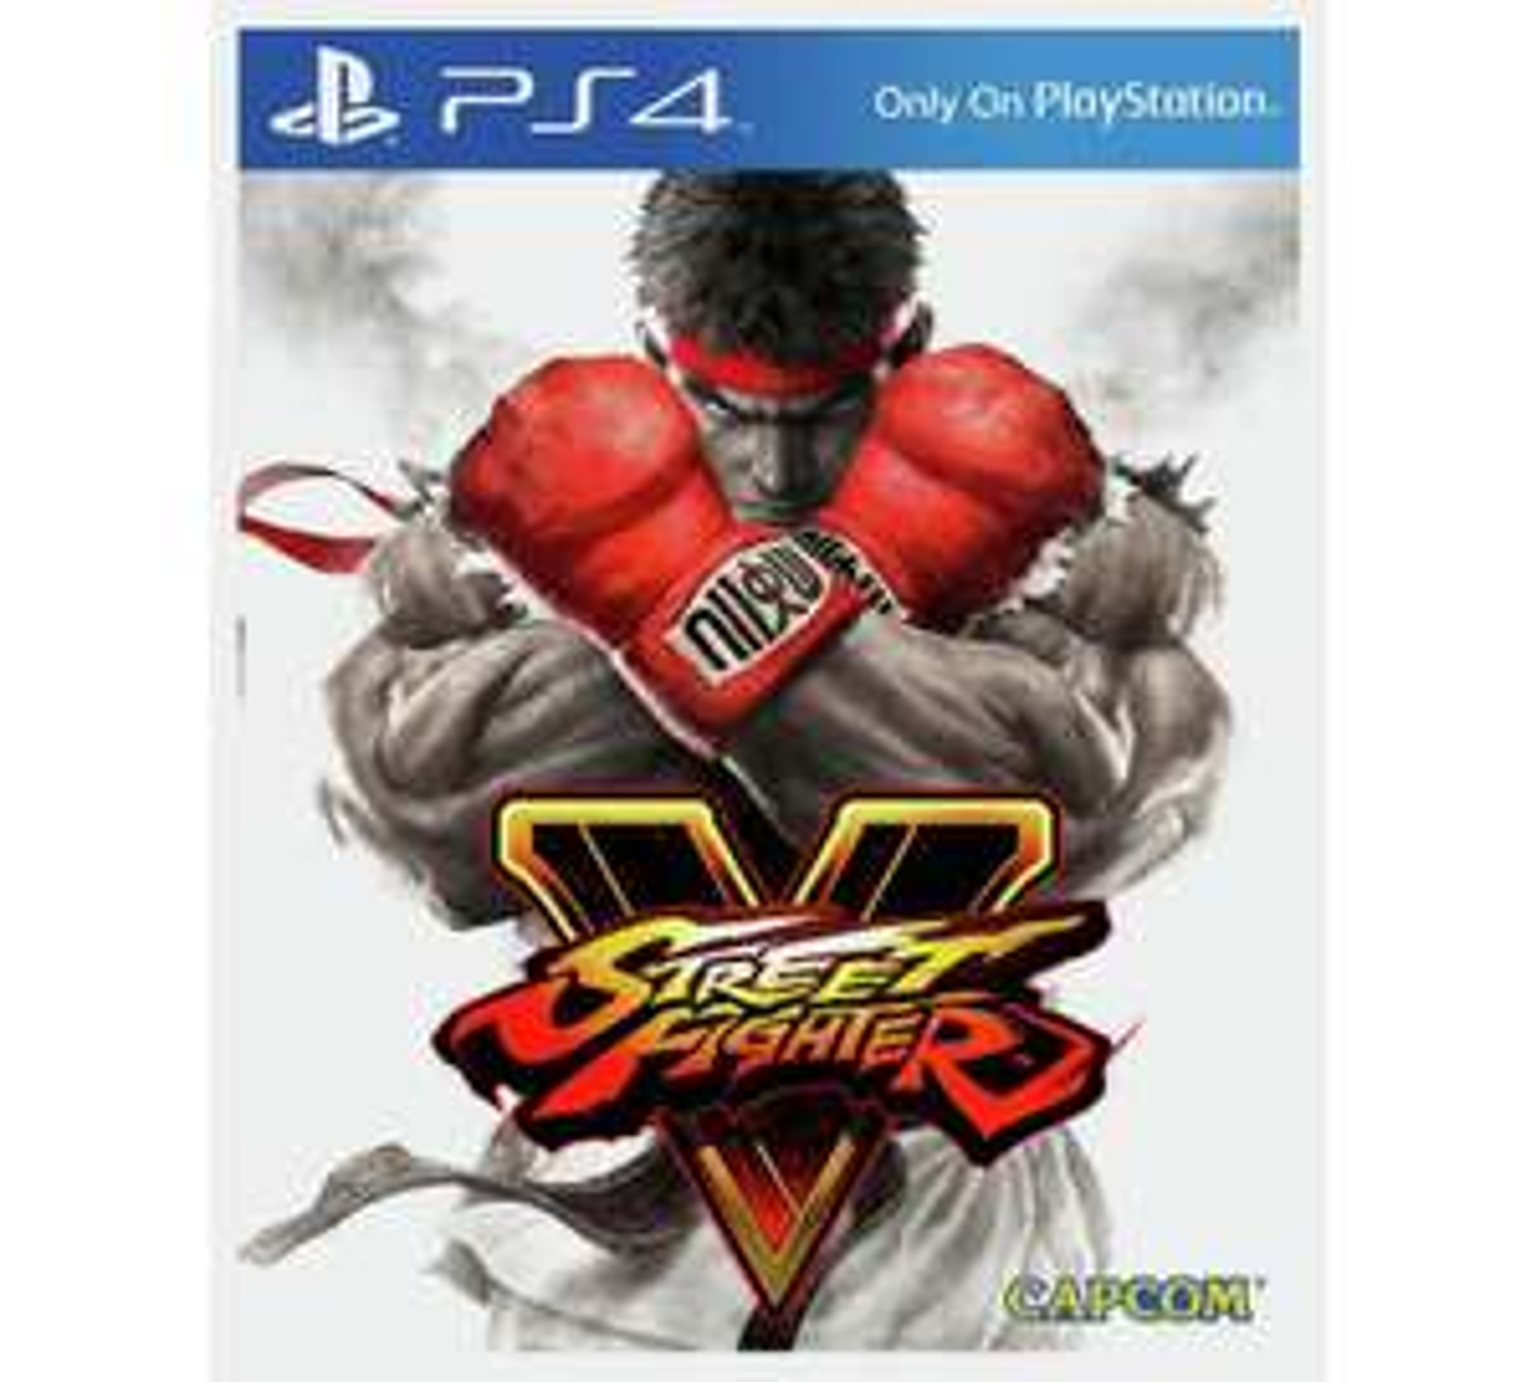 Street Fighter V - PS4 Game £10.99 at Argos